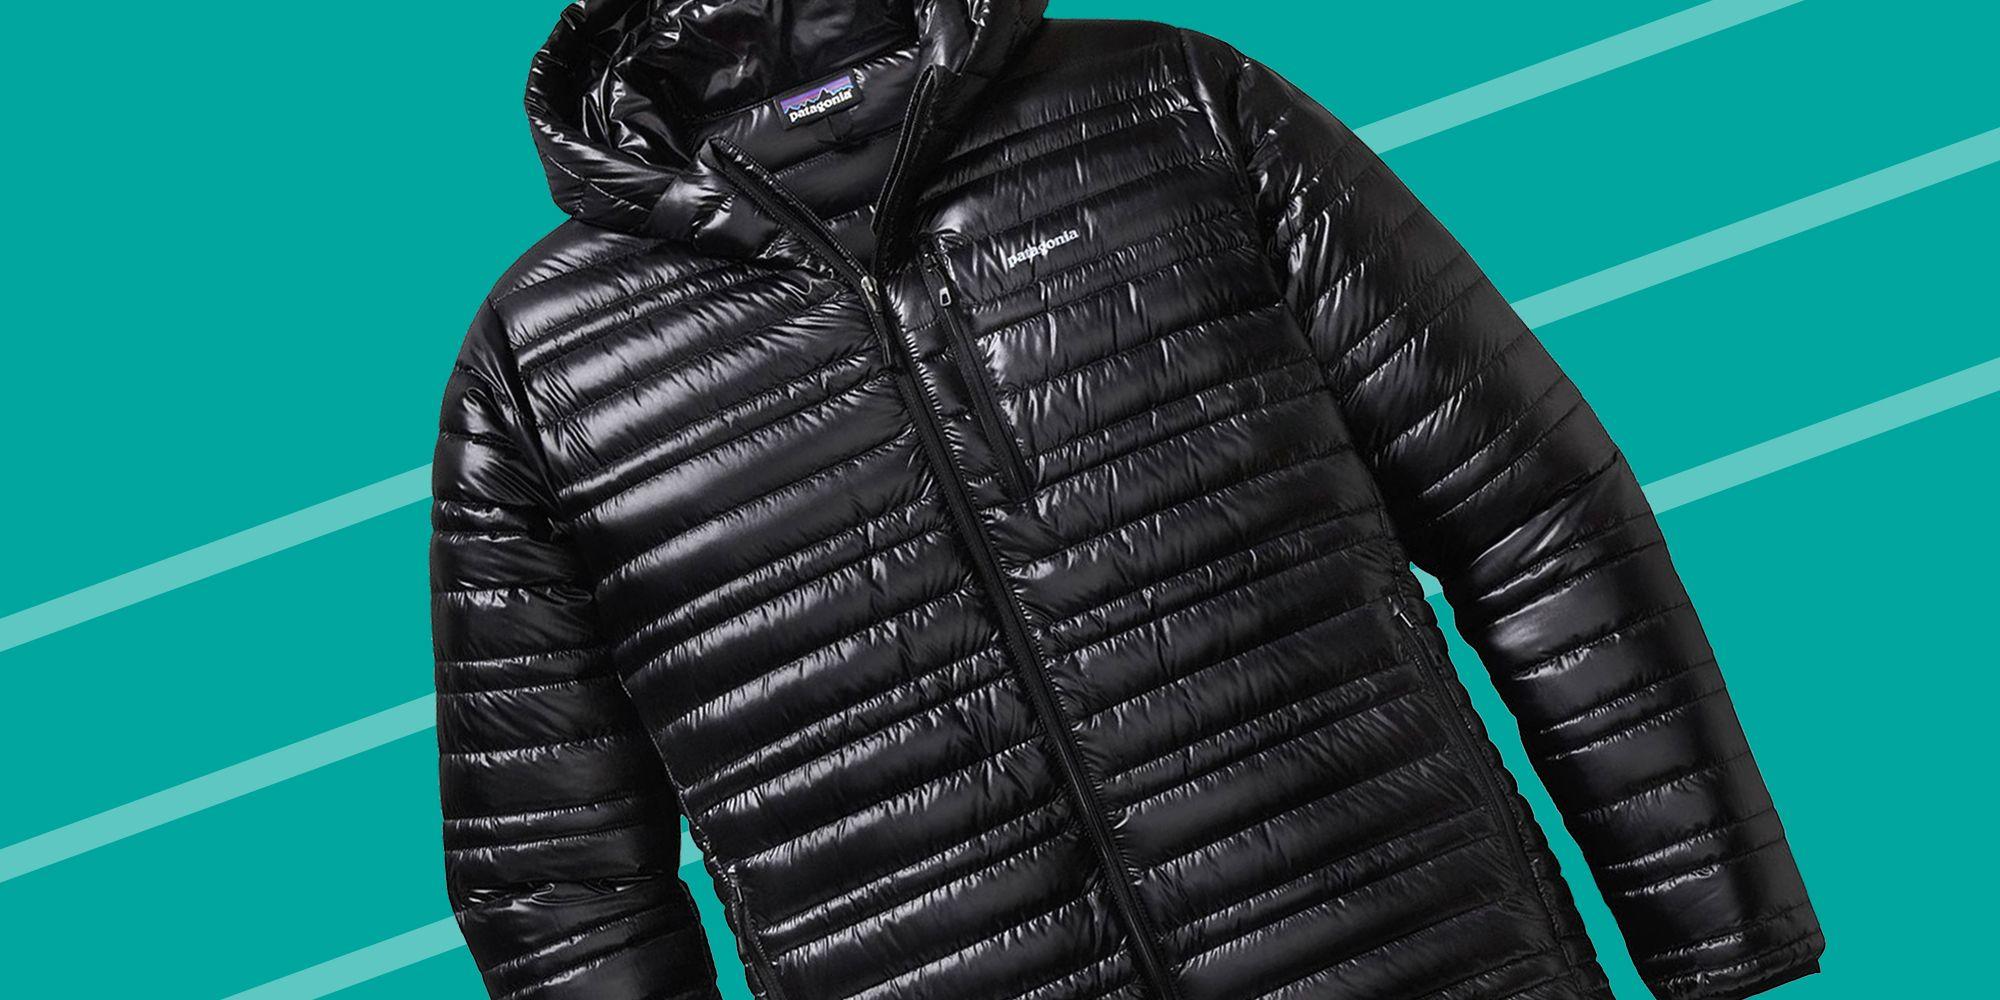 cf224178aa5 14 Best Down Jackets for Men & Women in 2018 - Down Winter Coats and ...